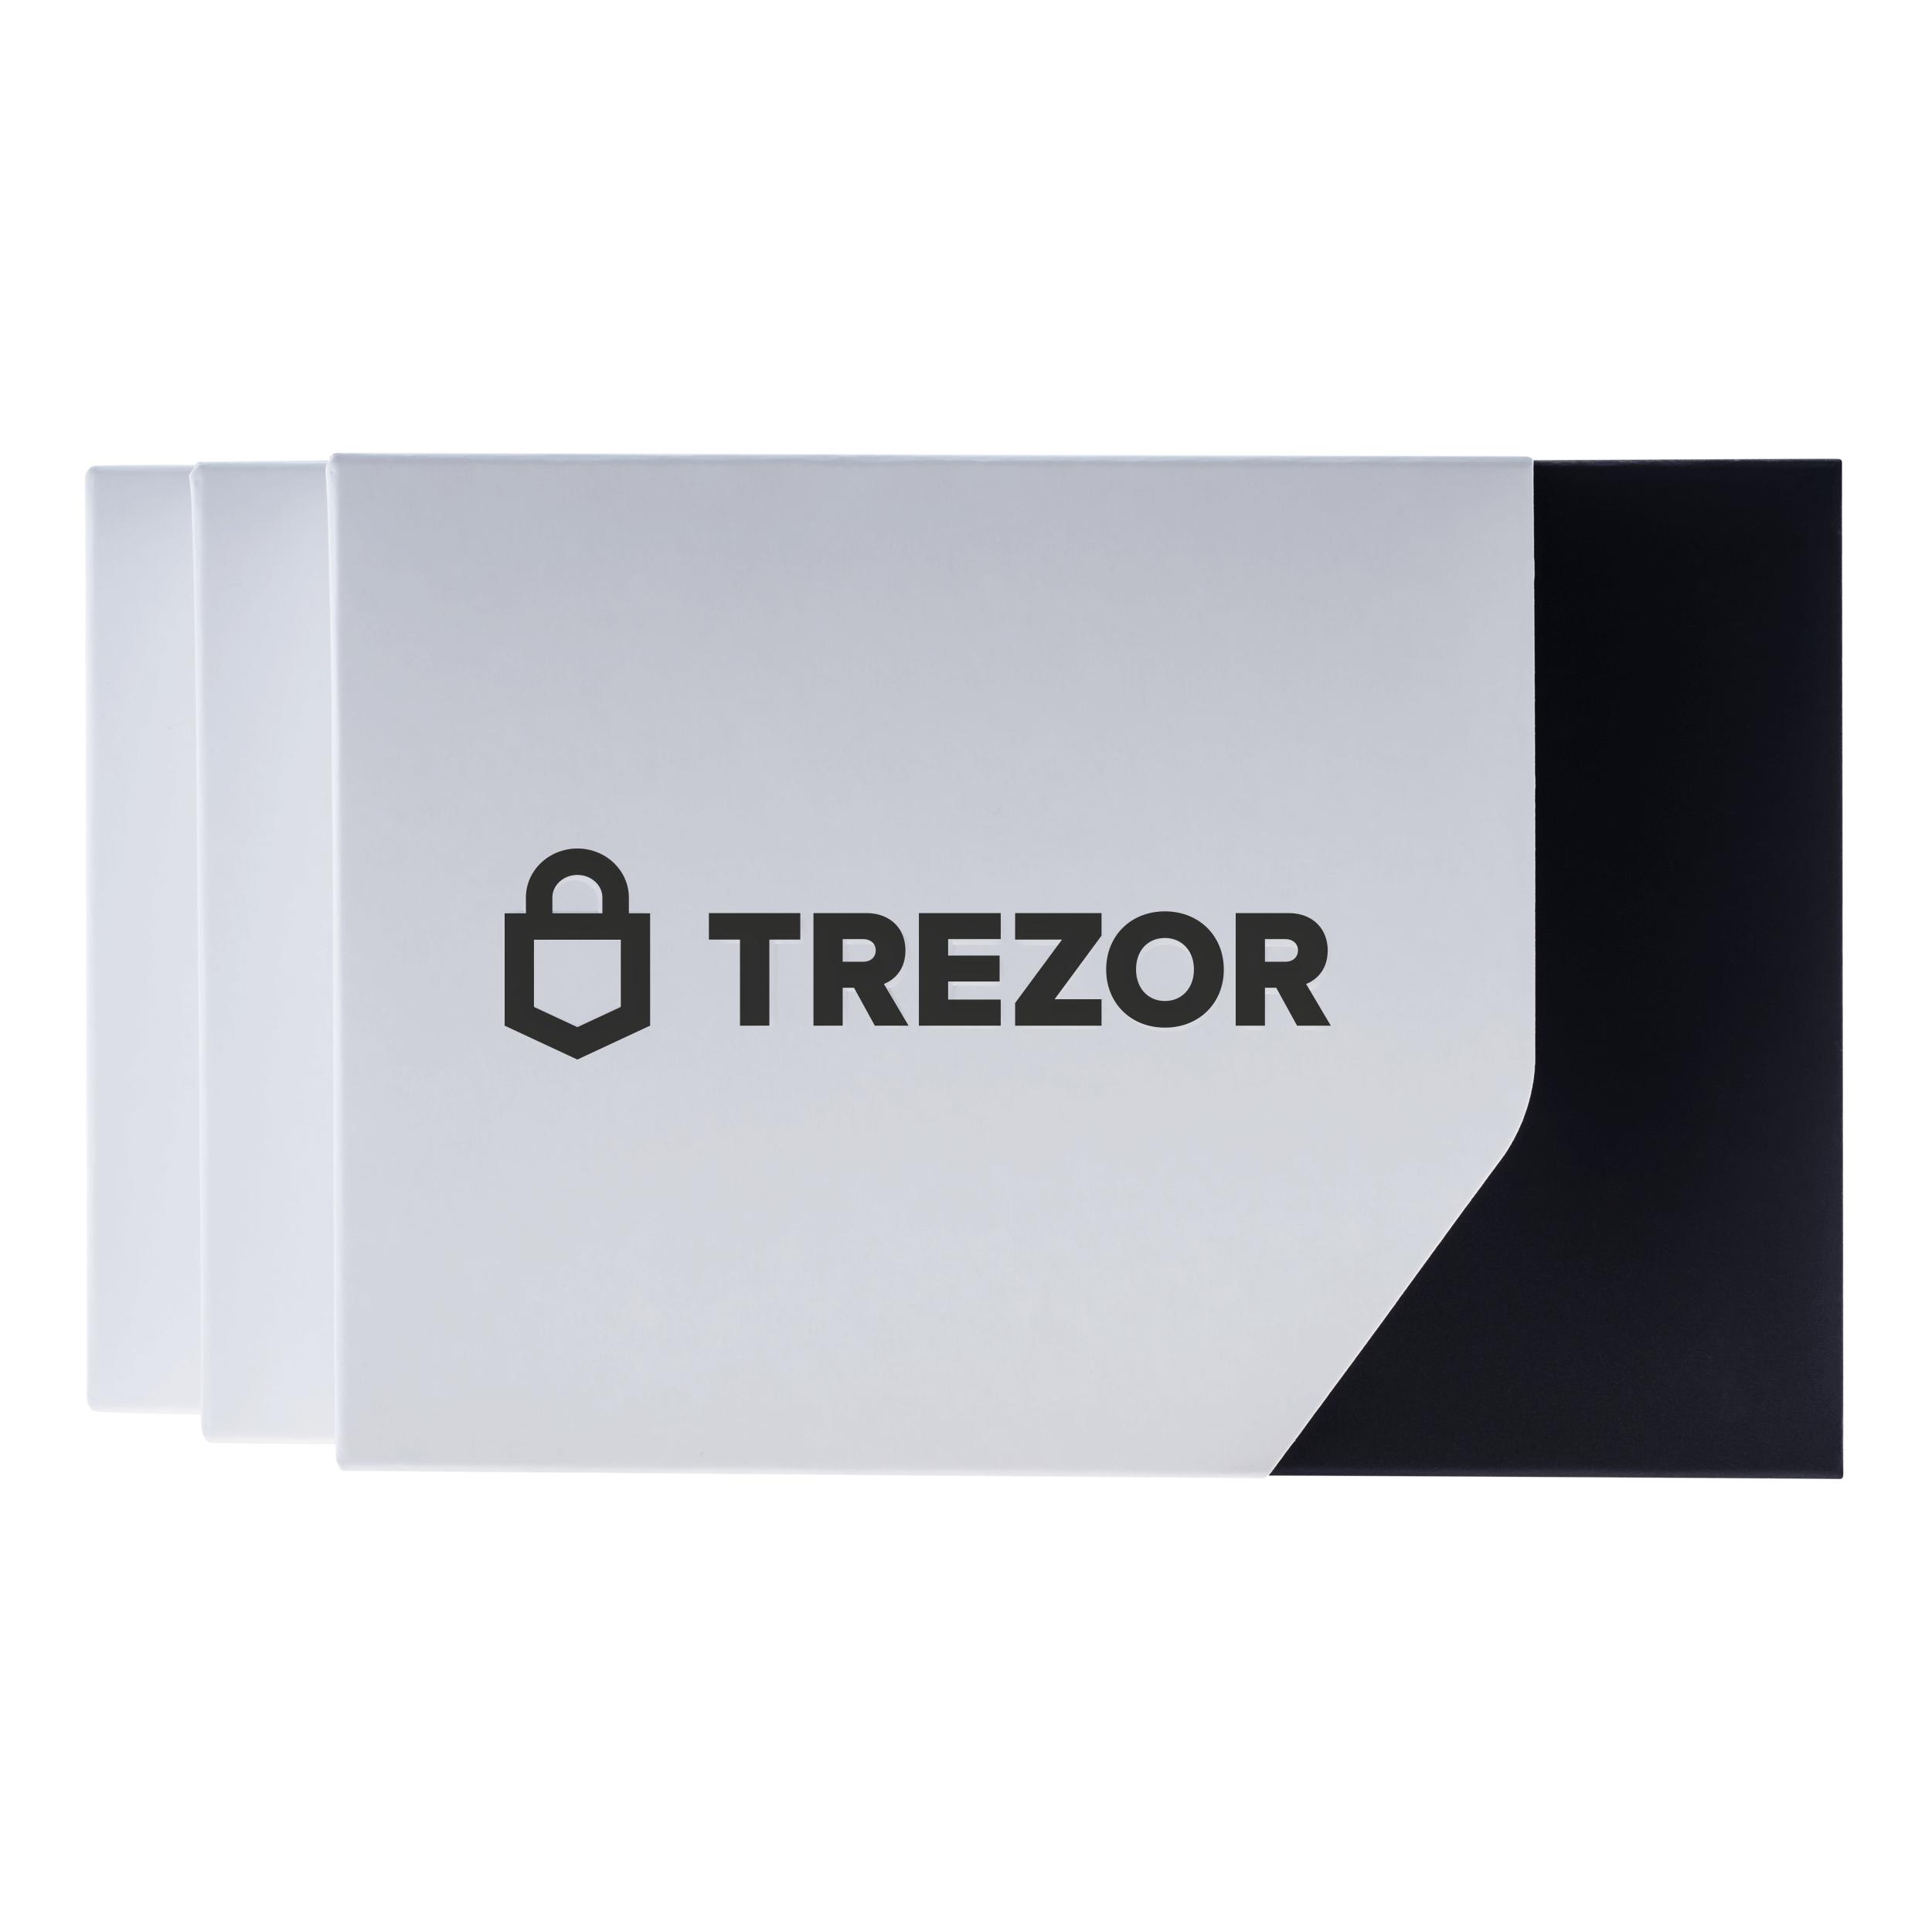 trezor_model_t_box_004.png